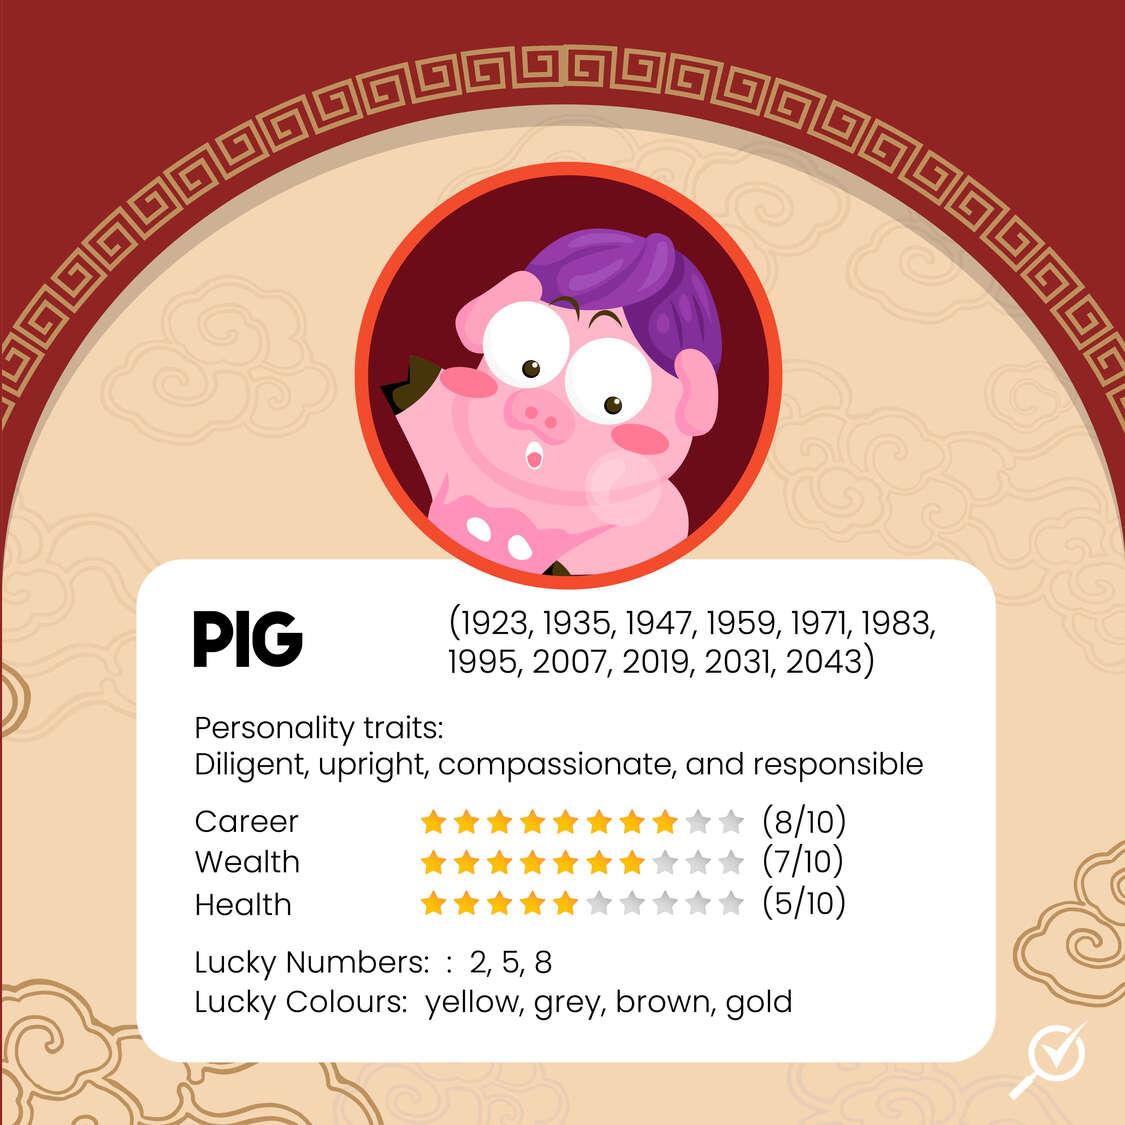 pig-chinese-zodiac